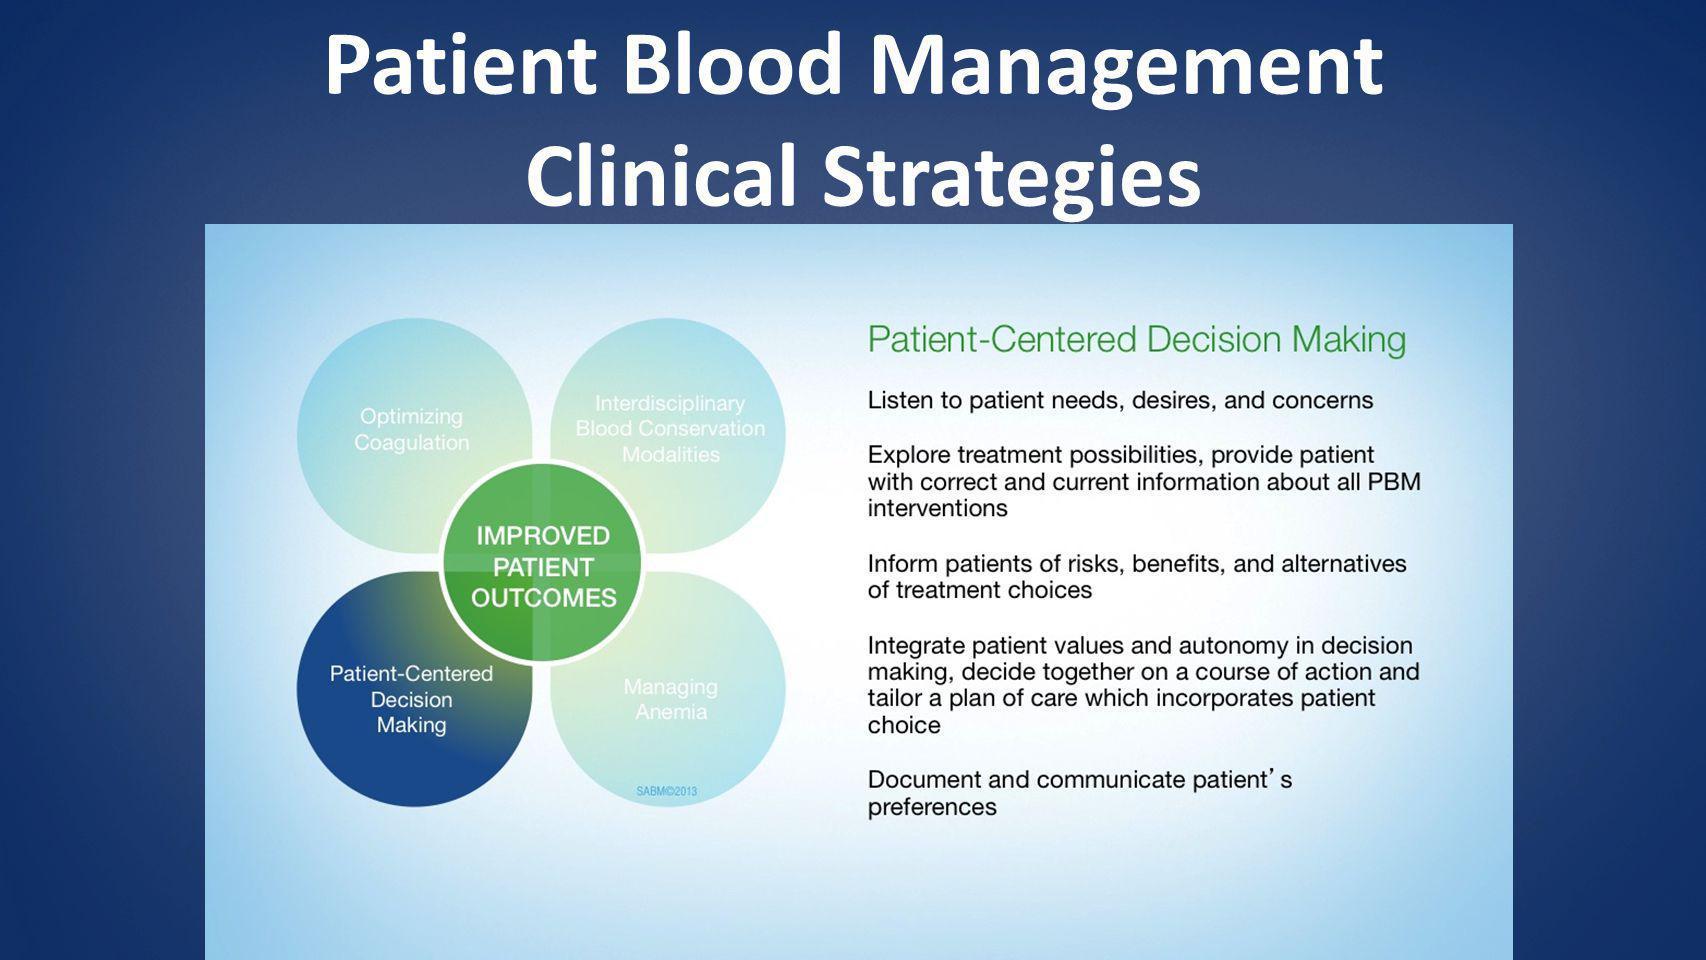 Patient Blood Management Clinical Strategies